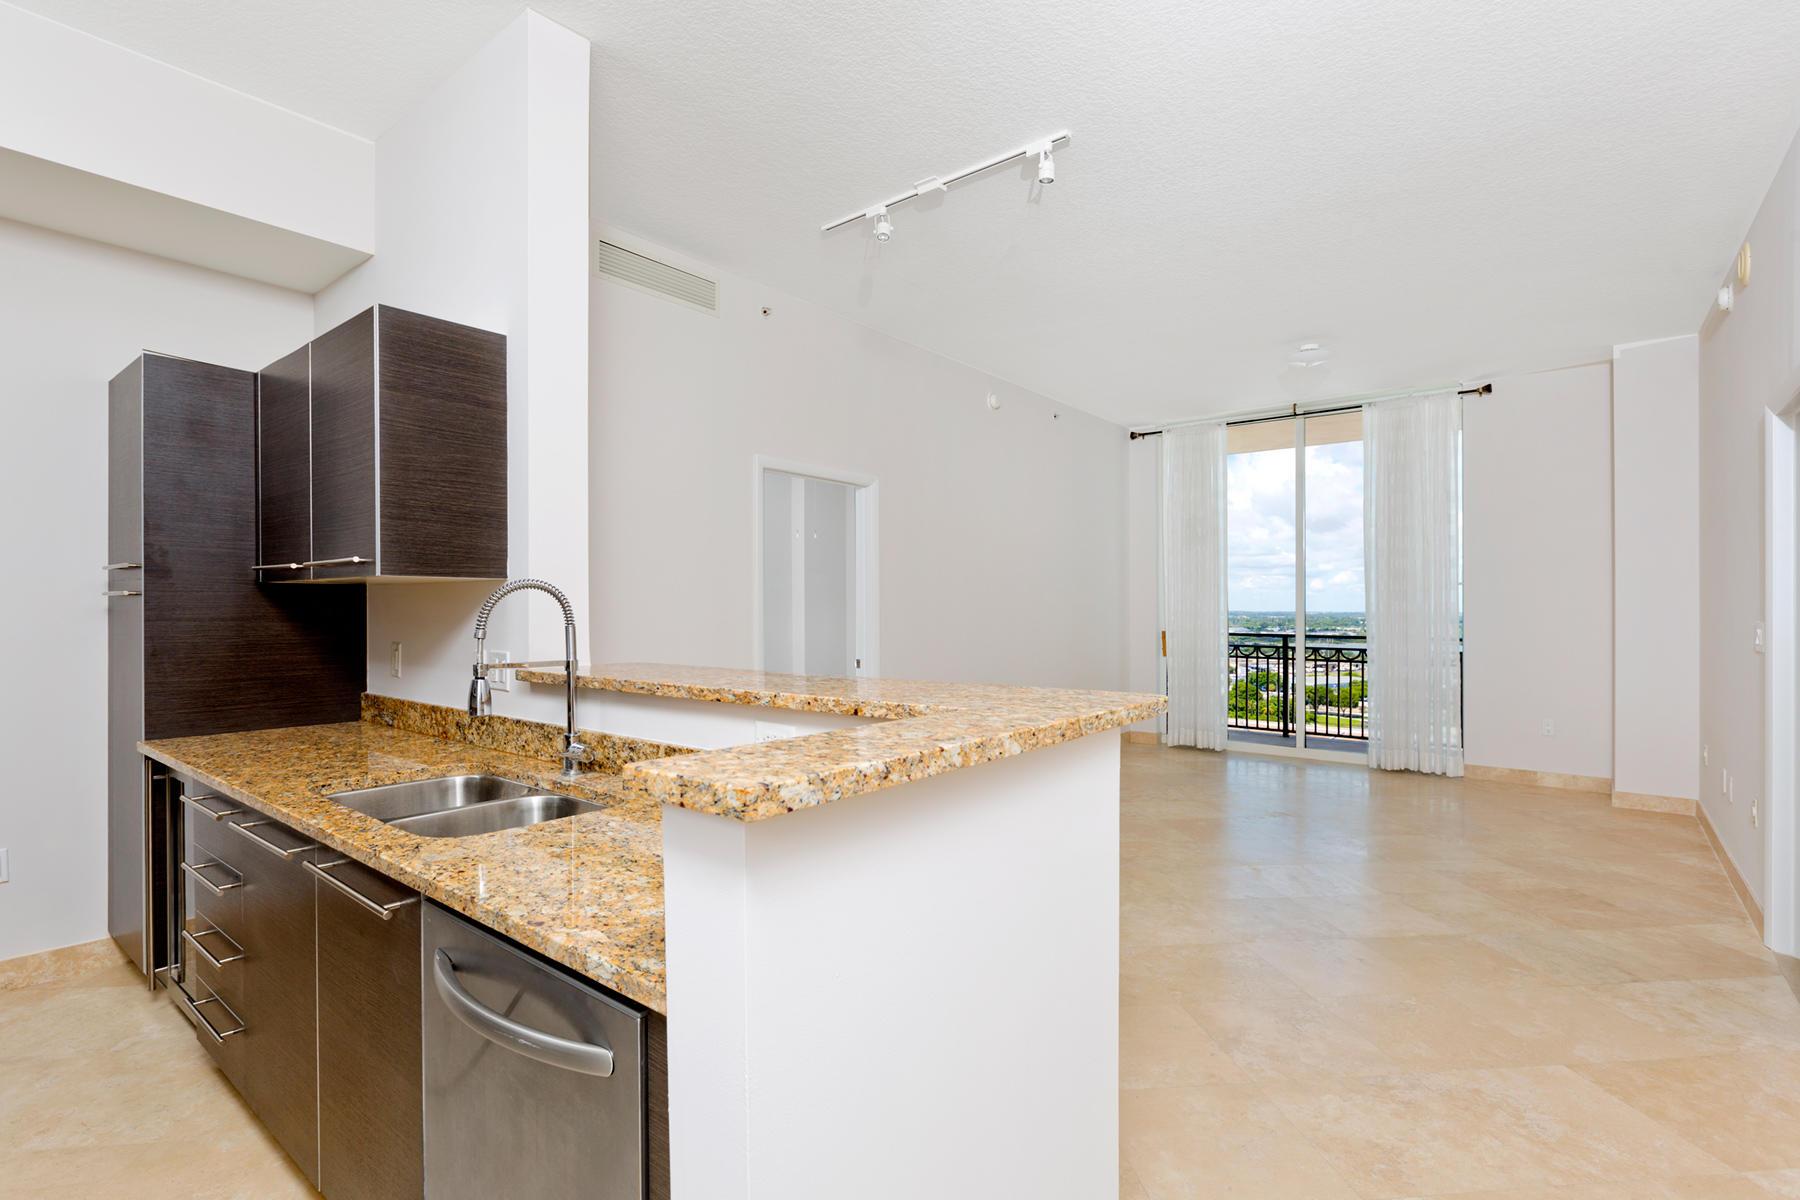 550 Okeechobee Boulevard Lph-20 West Palm Beach, FL 33401